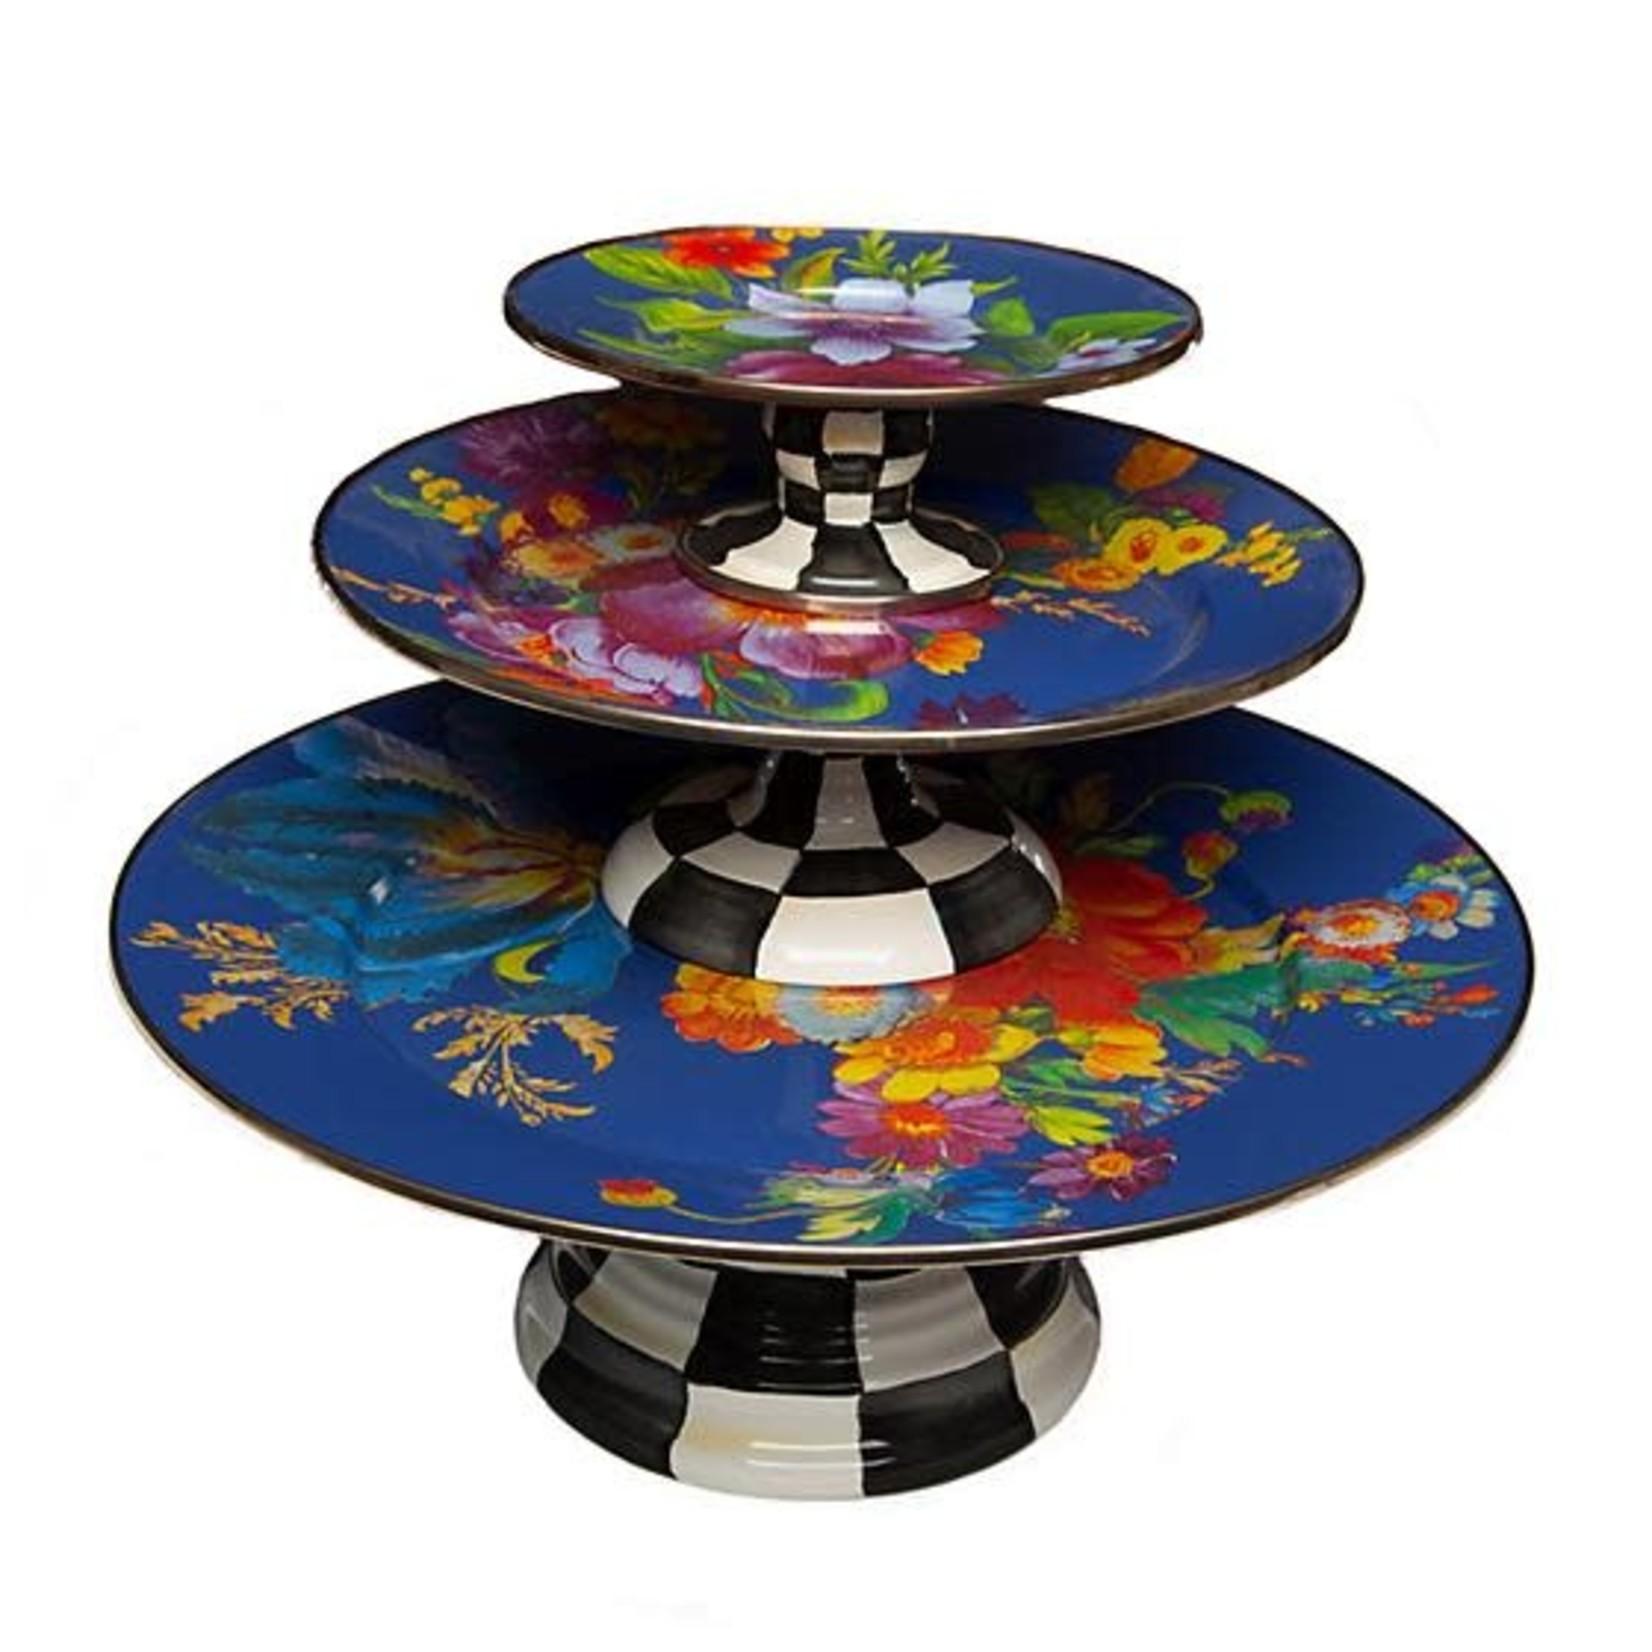 MacKenzie Childs Flower Market Small Pedestal Platter - Lapis